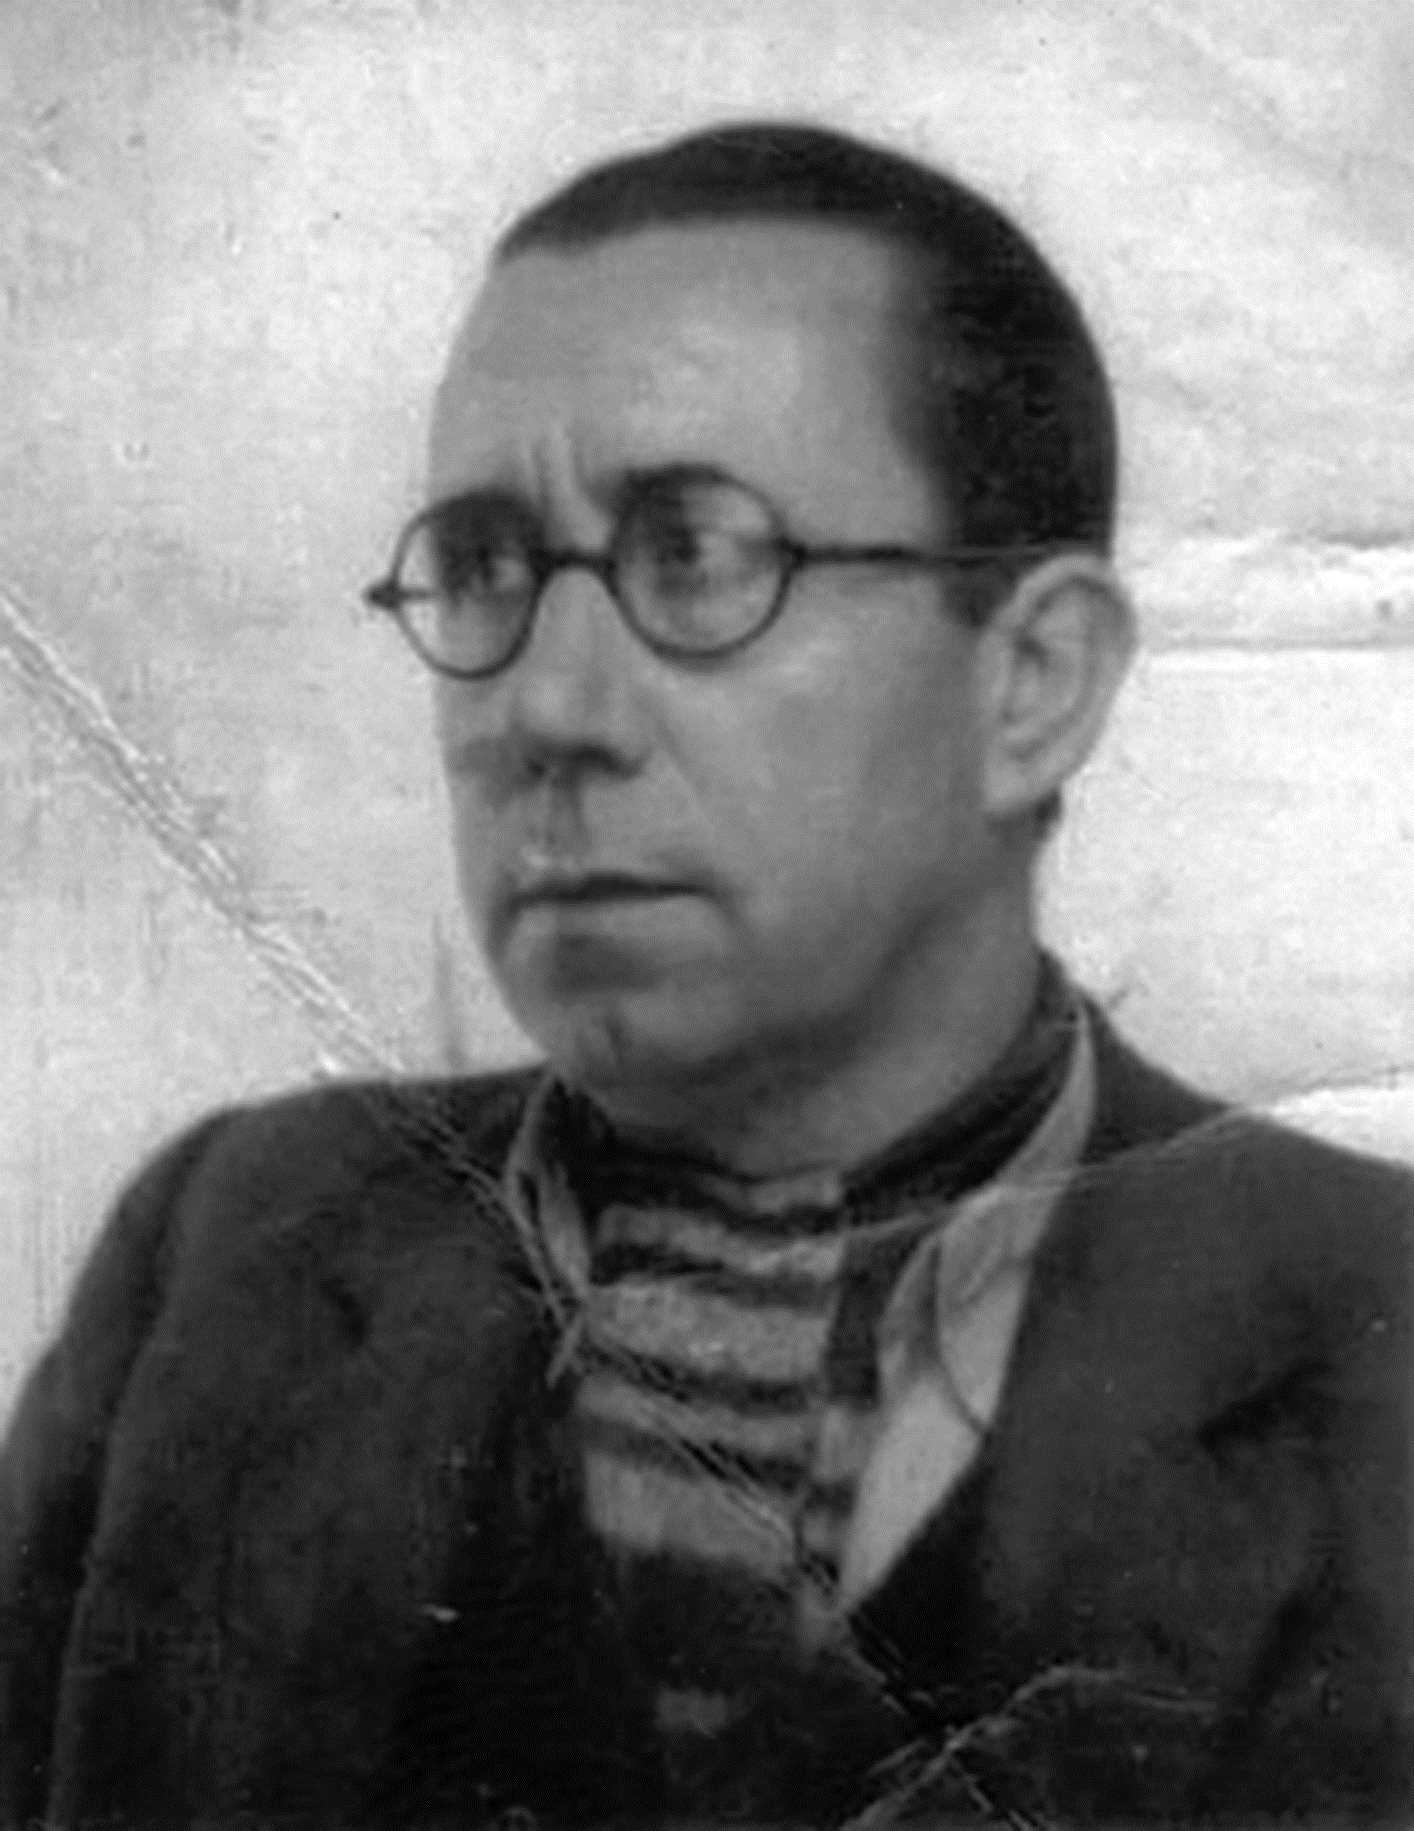 José Gilabert Navarro